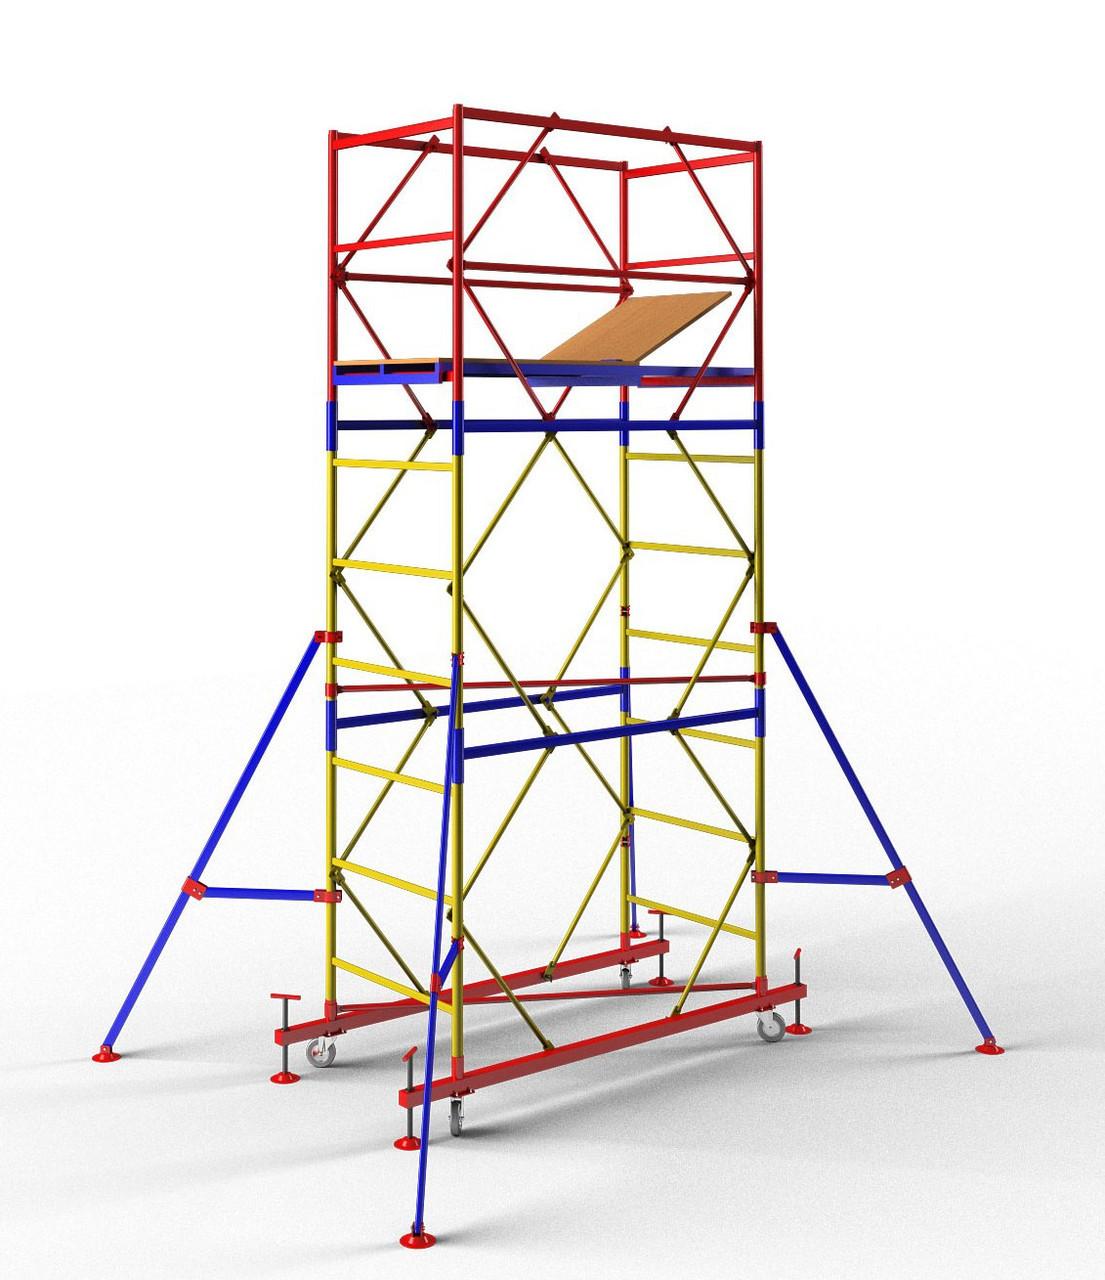 Вышка-тура мобильная облегченная 1,2 х 2,0 м (8+1) Раб.высота 12,2 м